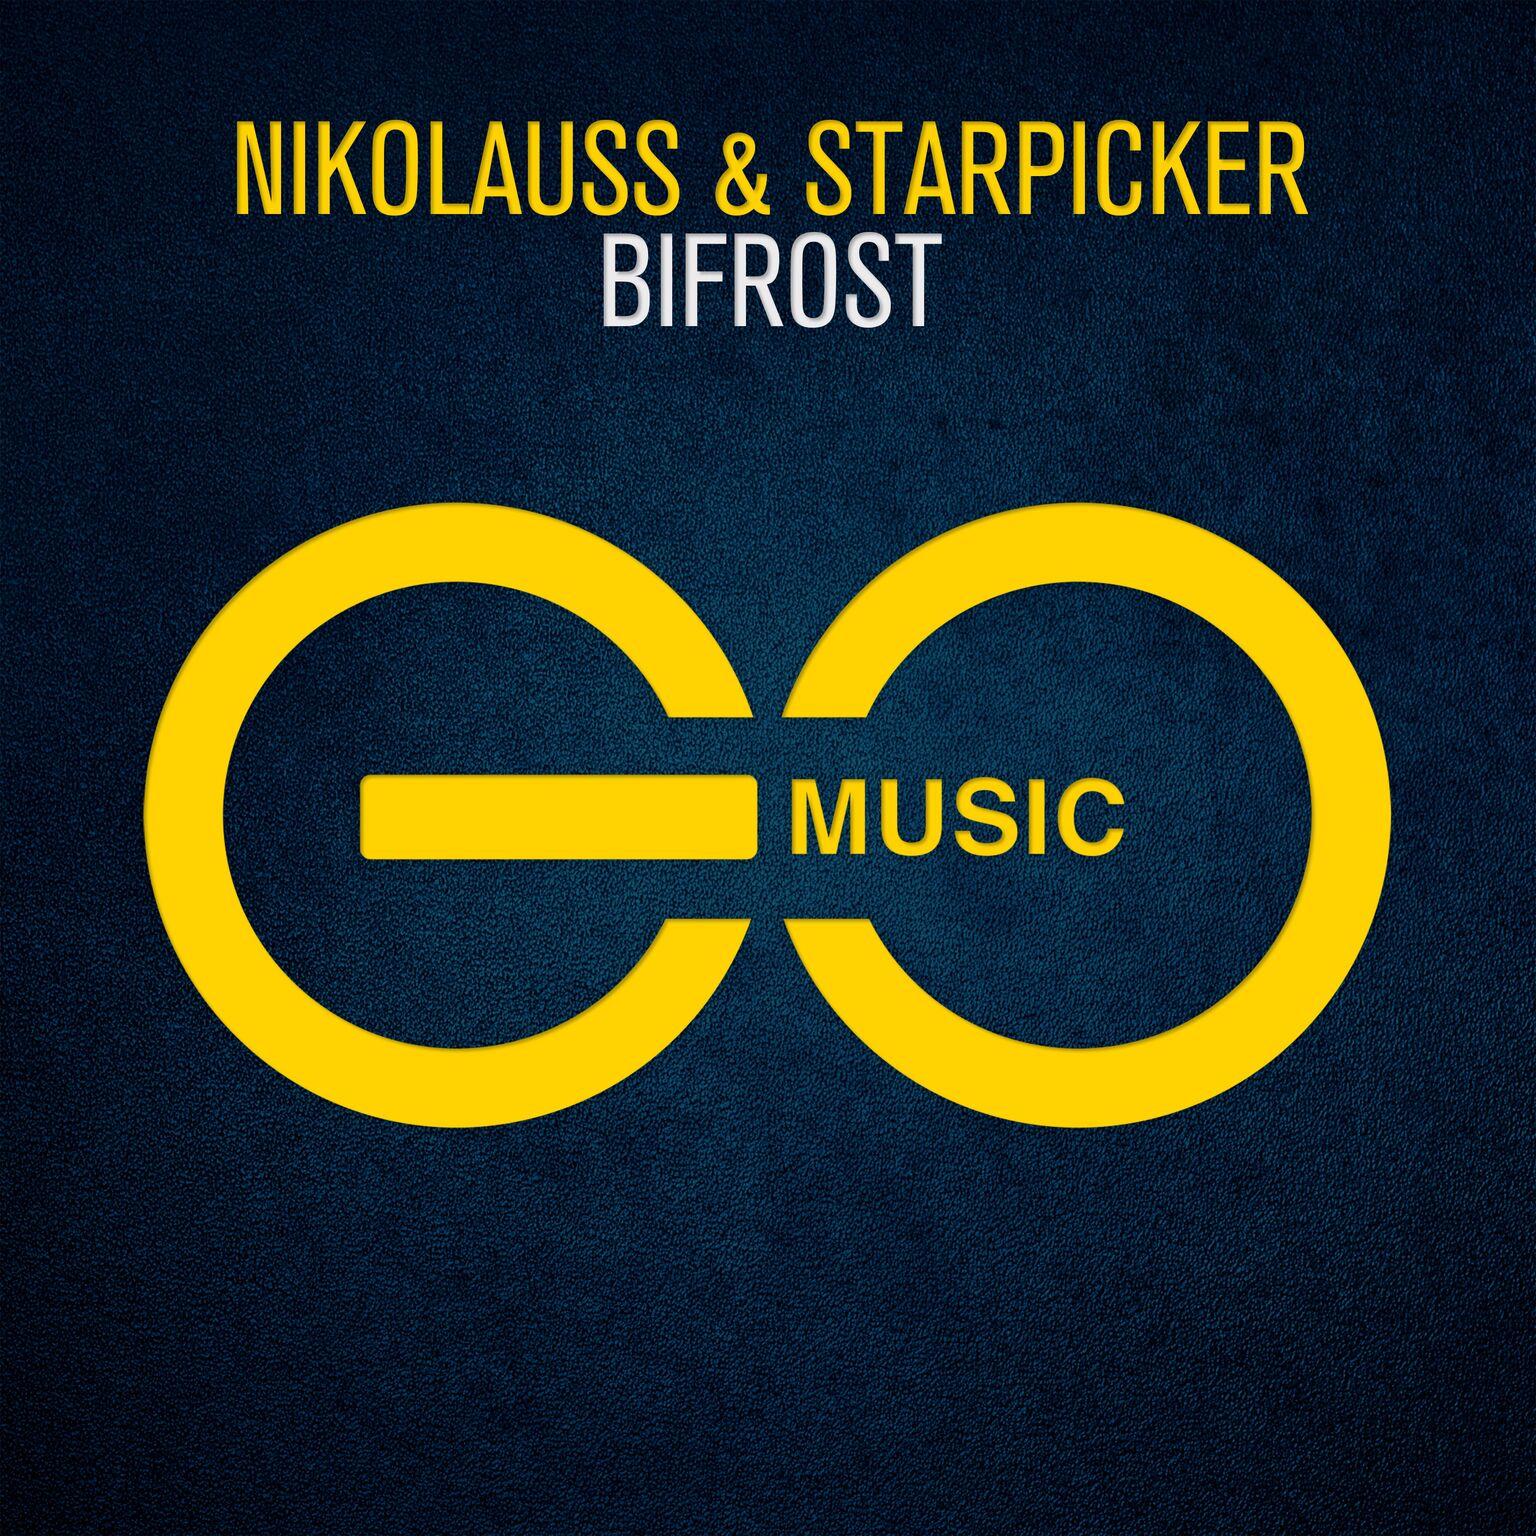 Nikolauss & Starpicker Bifrost